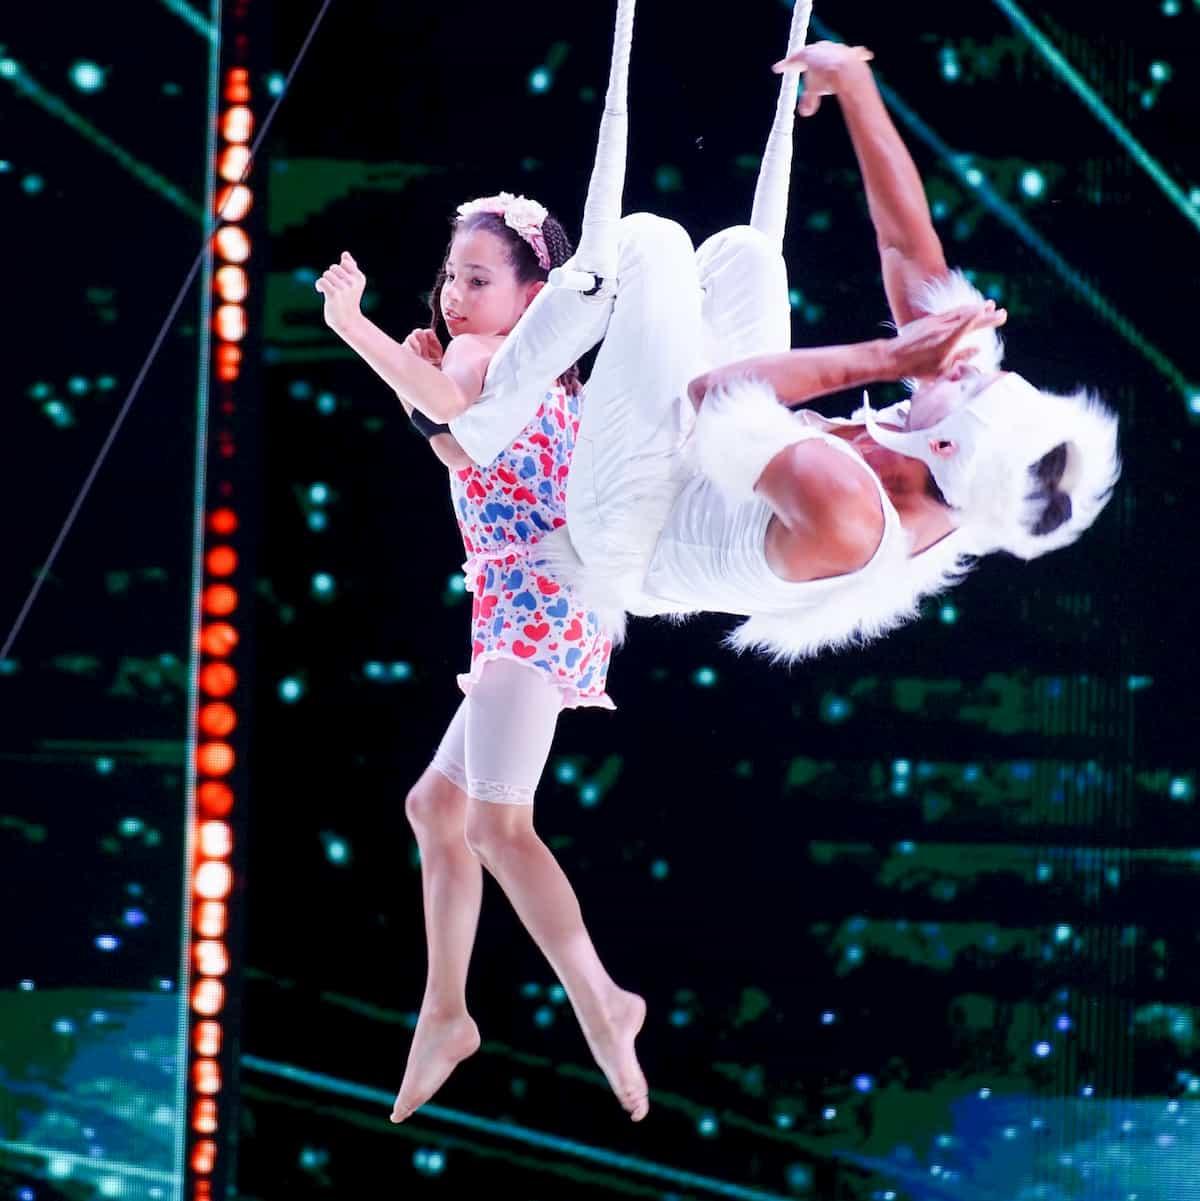 Lorena Lütke und Jailton Carneiro de Jesus beim Supertalent am 7.12.2019